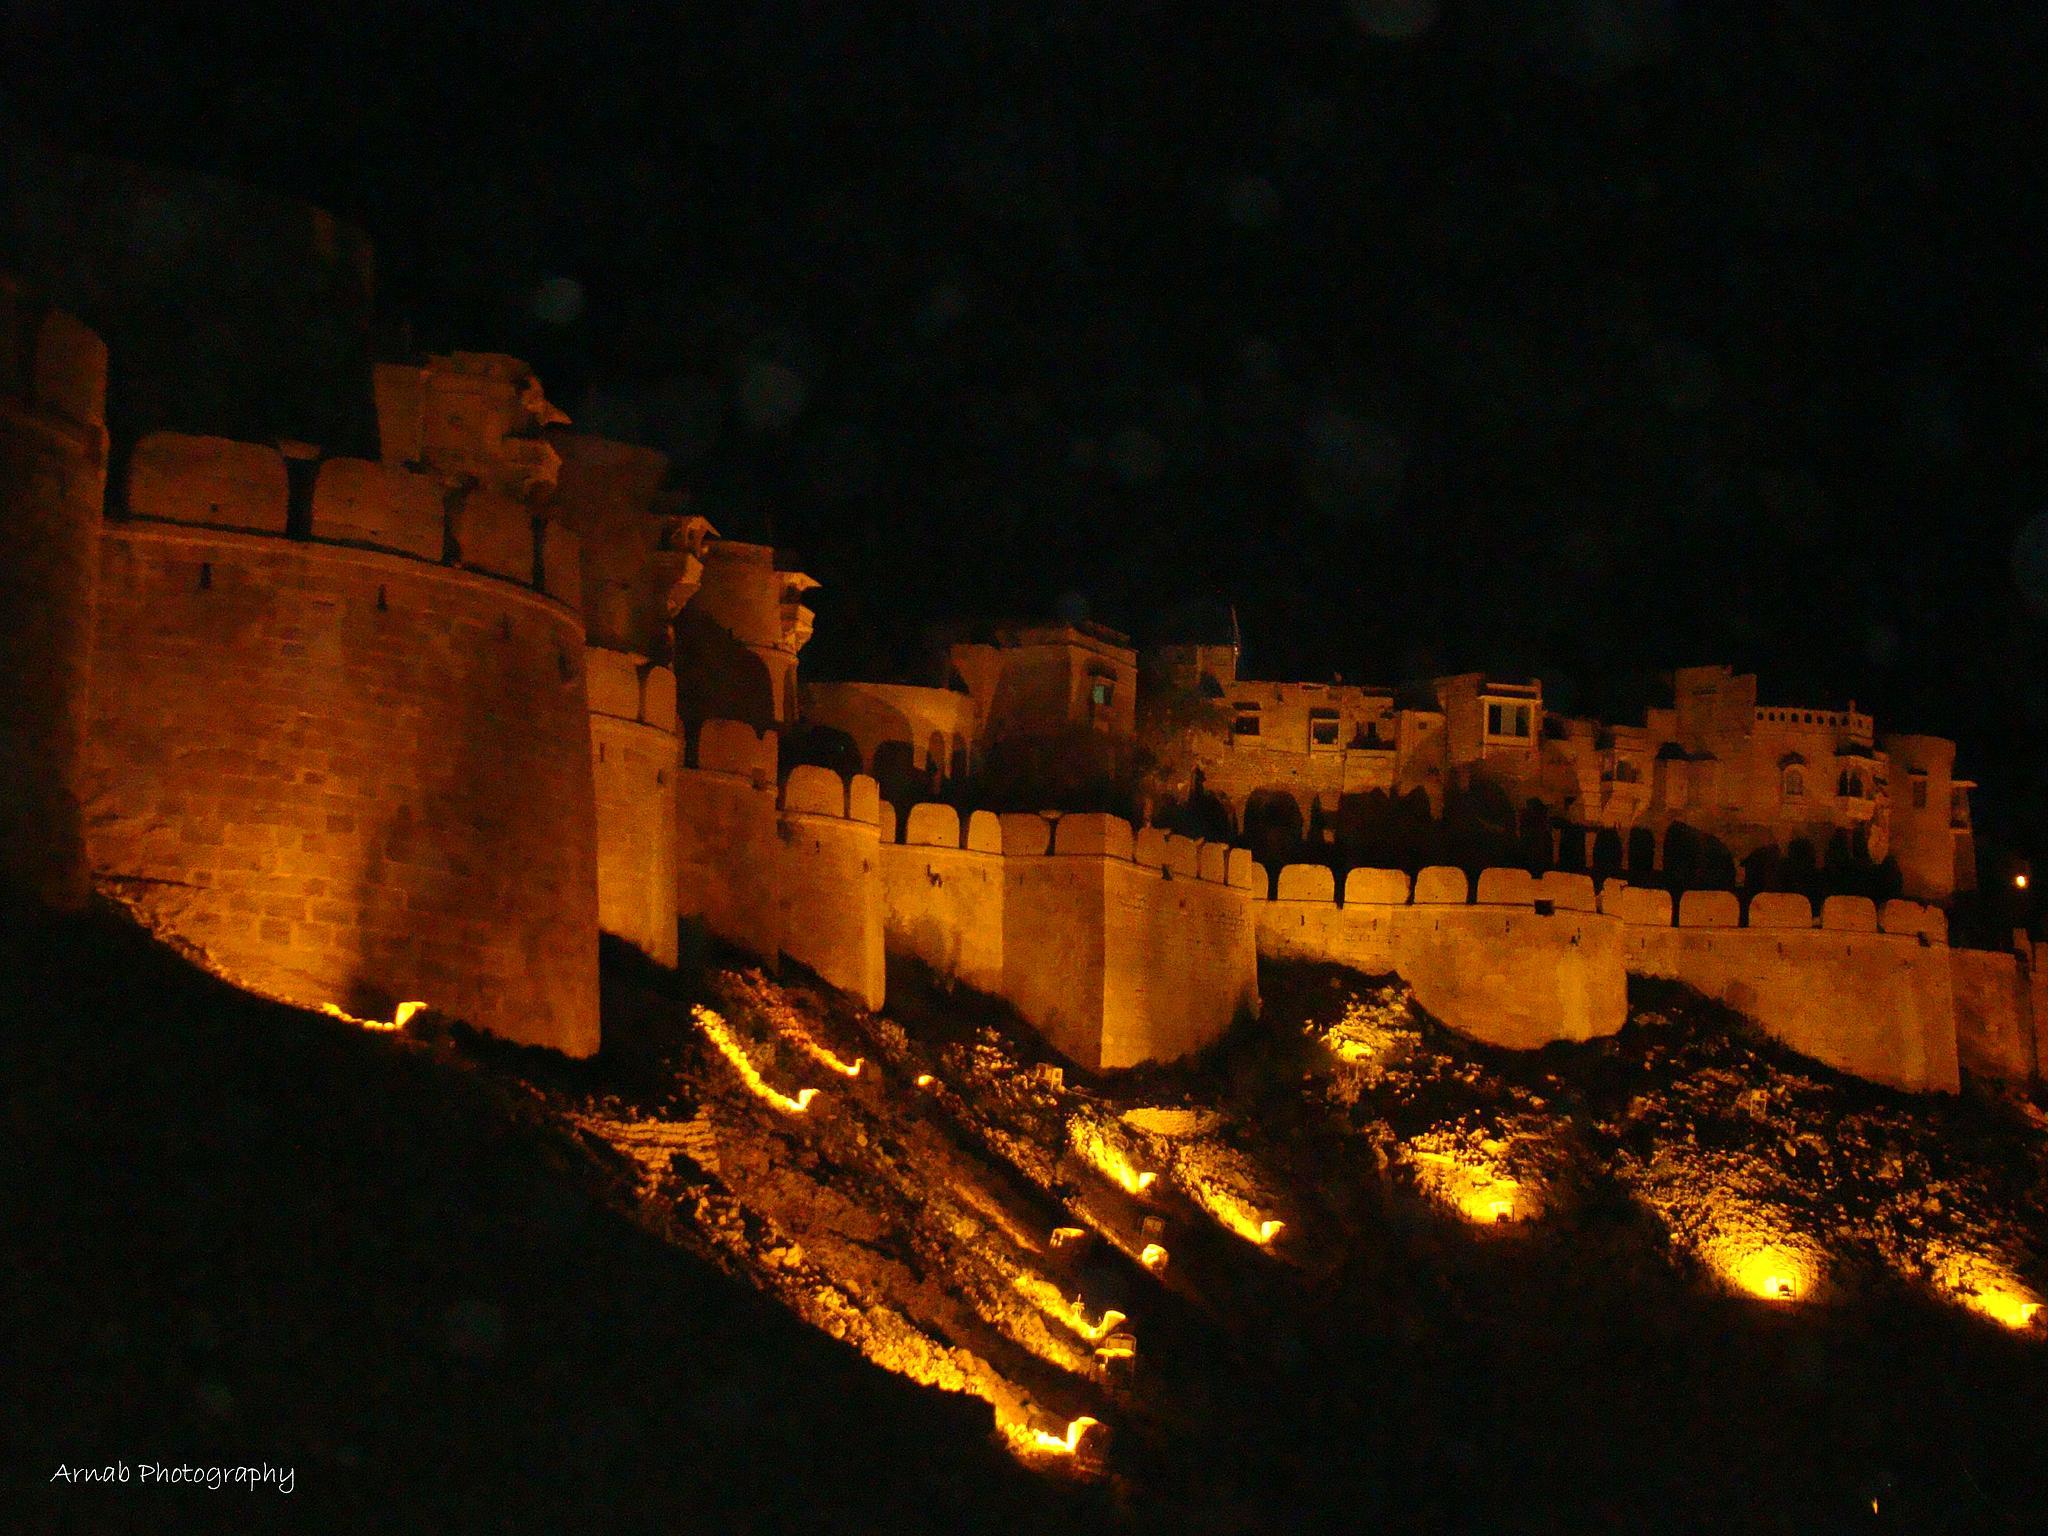 Sonar Kella (The Golden Castle of Rajasthan) by Arnab Chatterjee